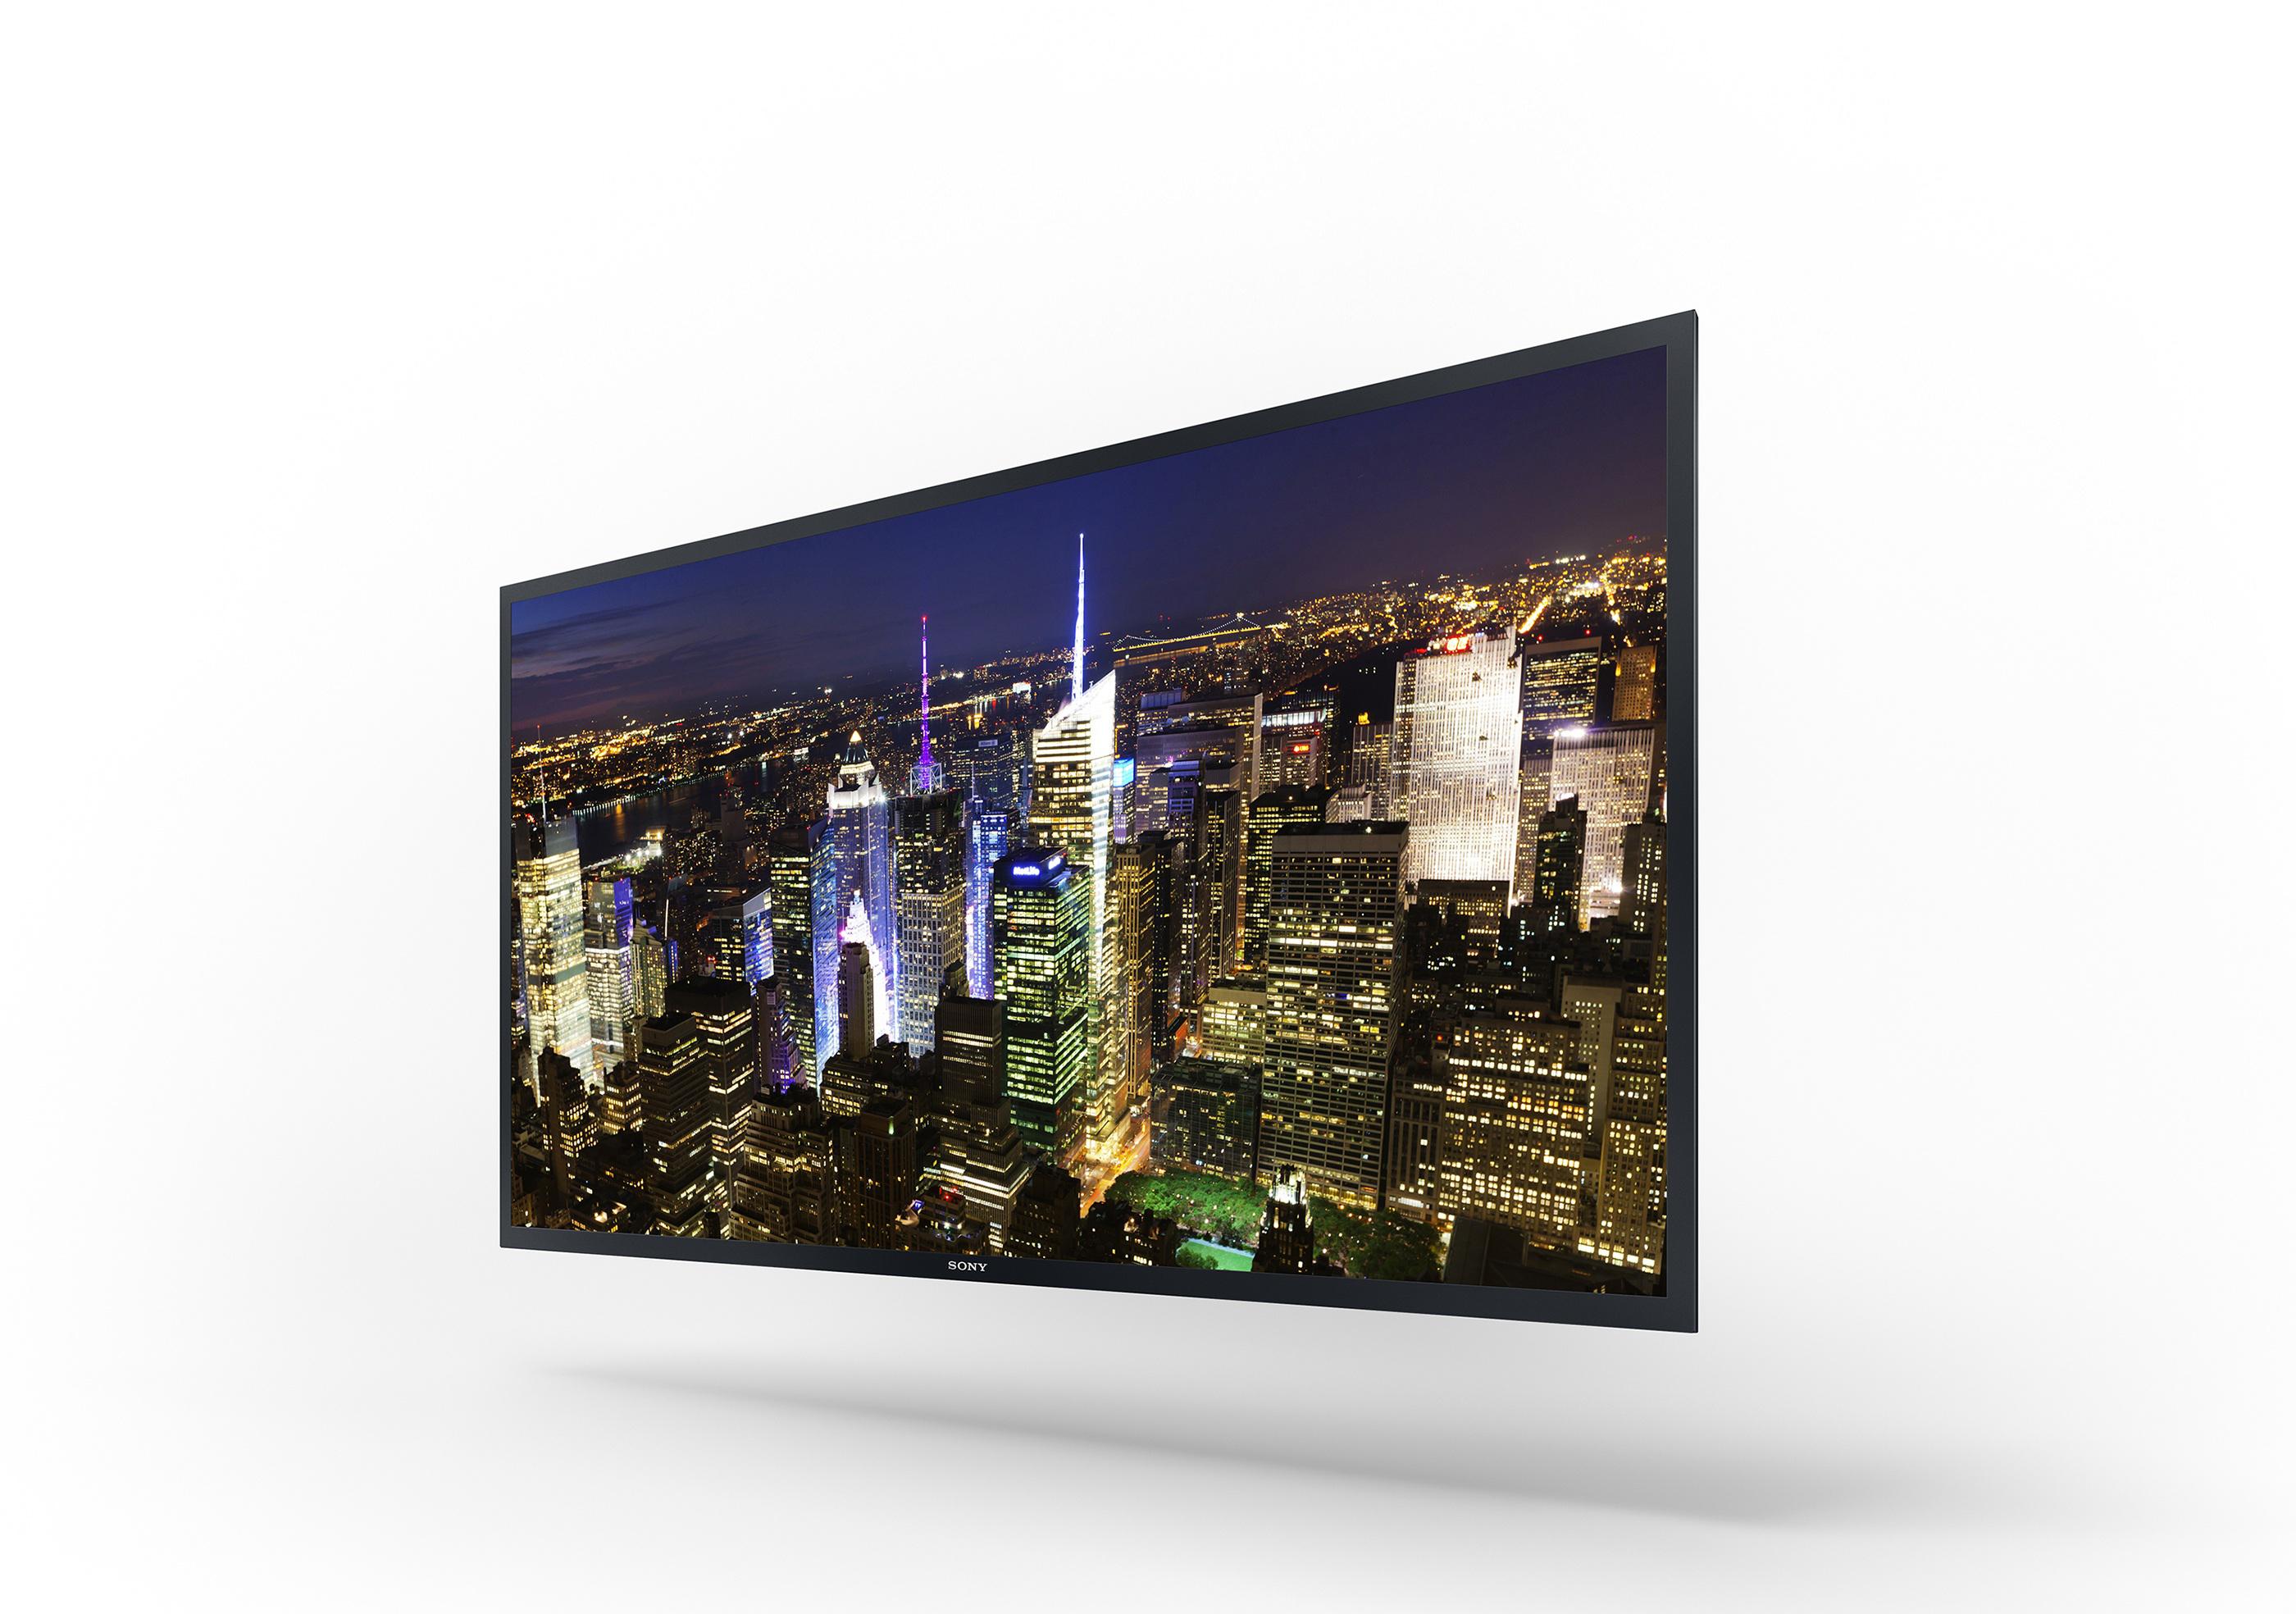 Sony-4K-OLED